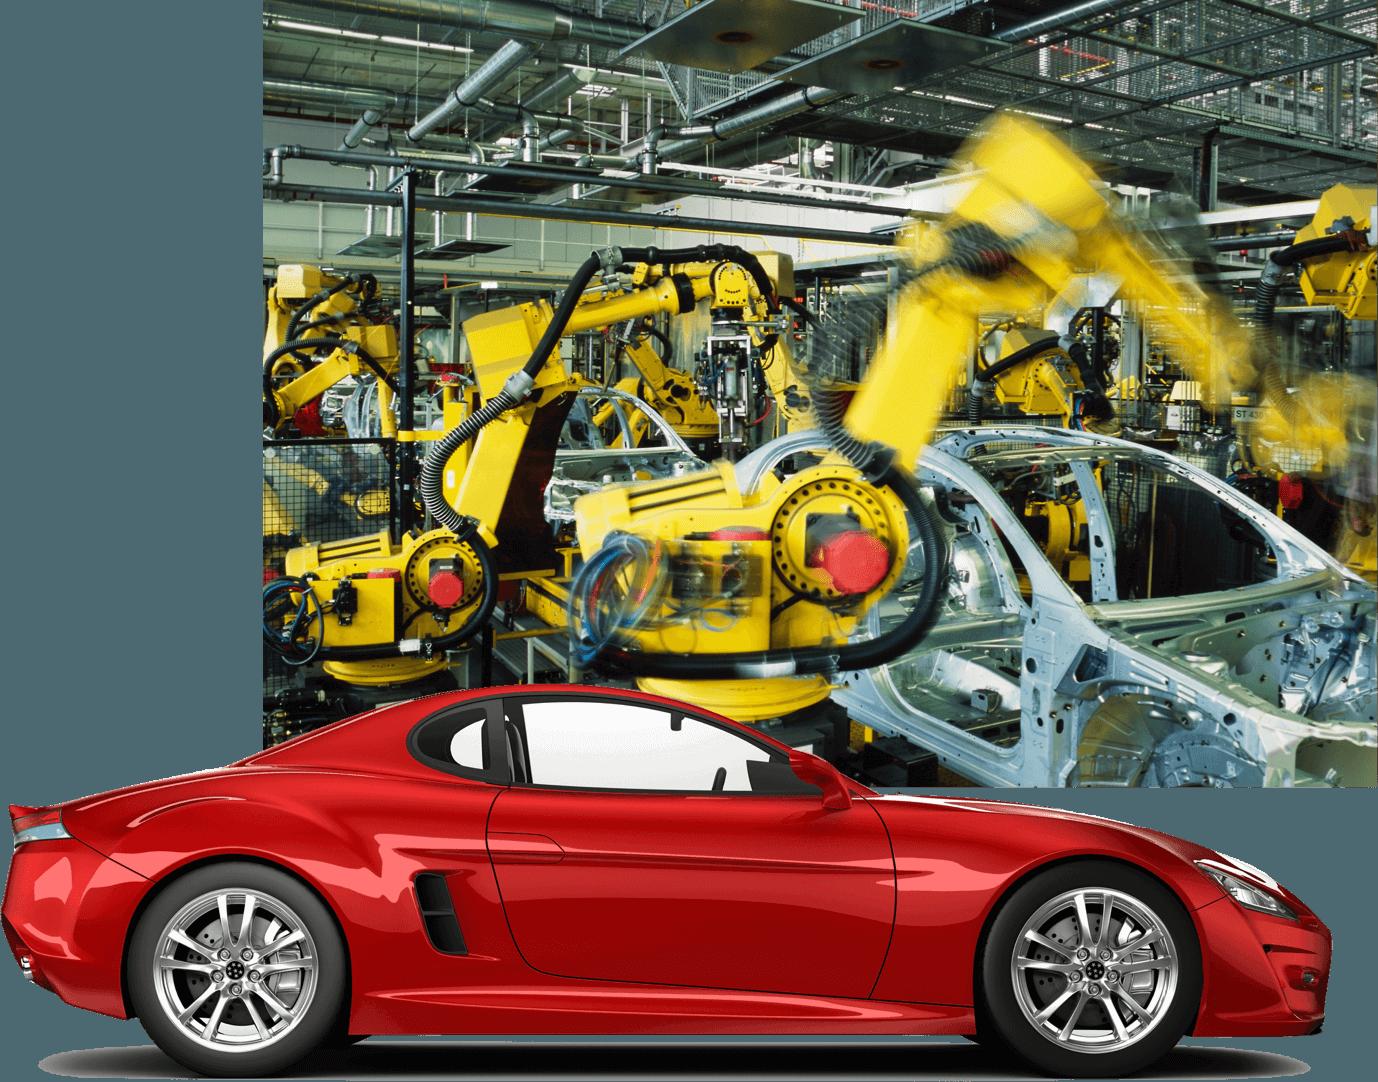 Automotive manufacturing facility